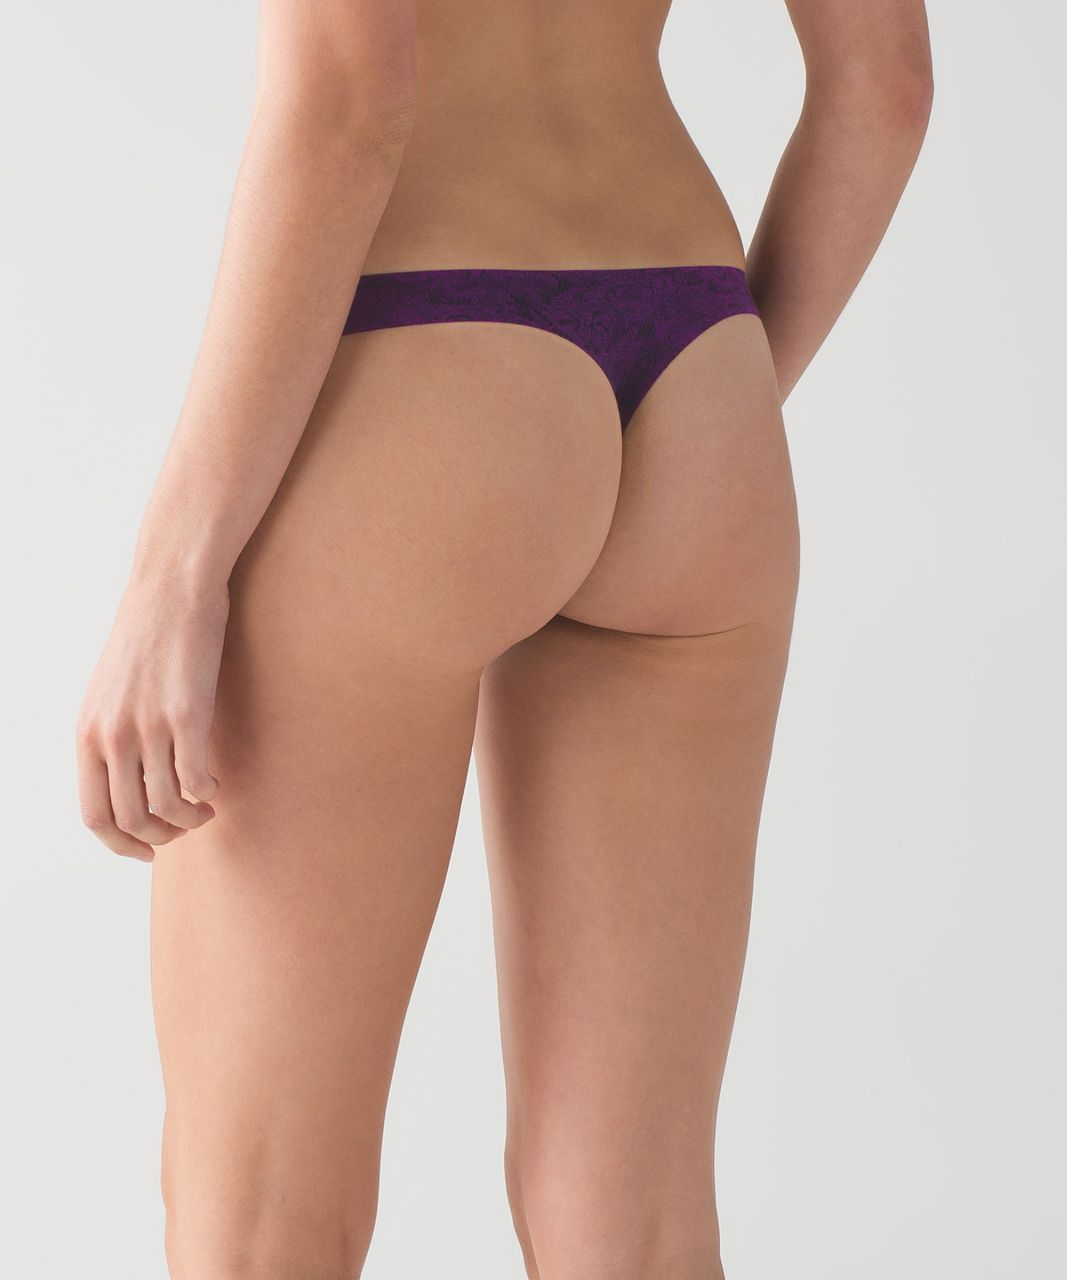 Lululemon Namastay Put Thong - Mini Pencil Lace Aurora Black